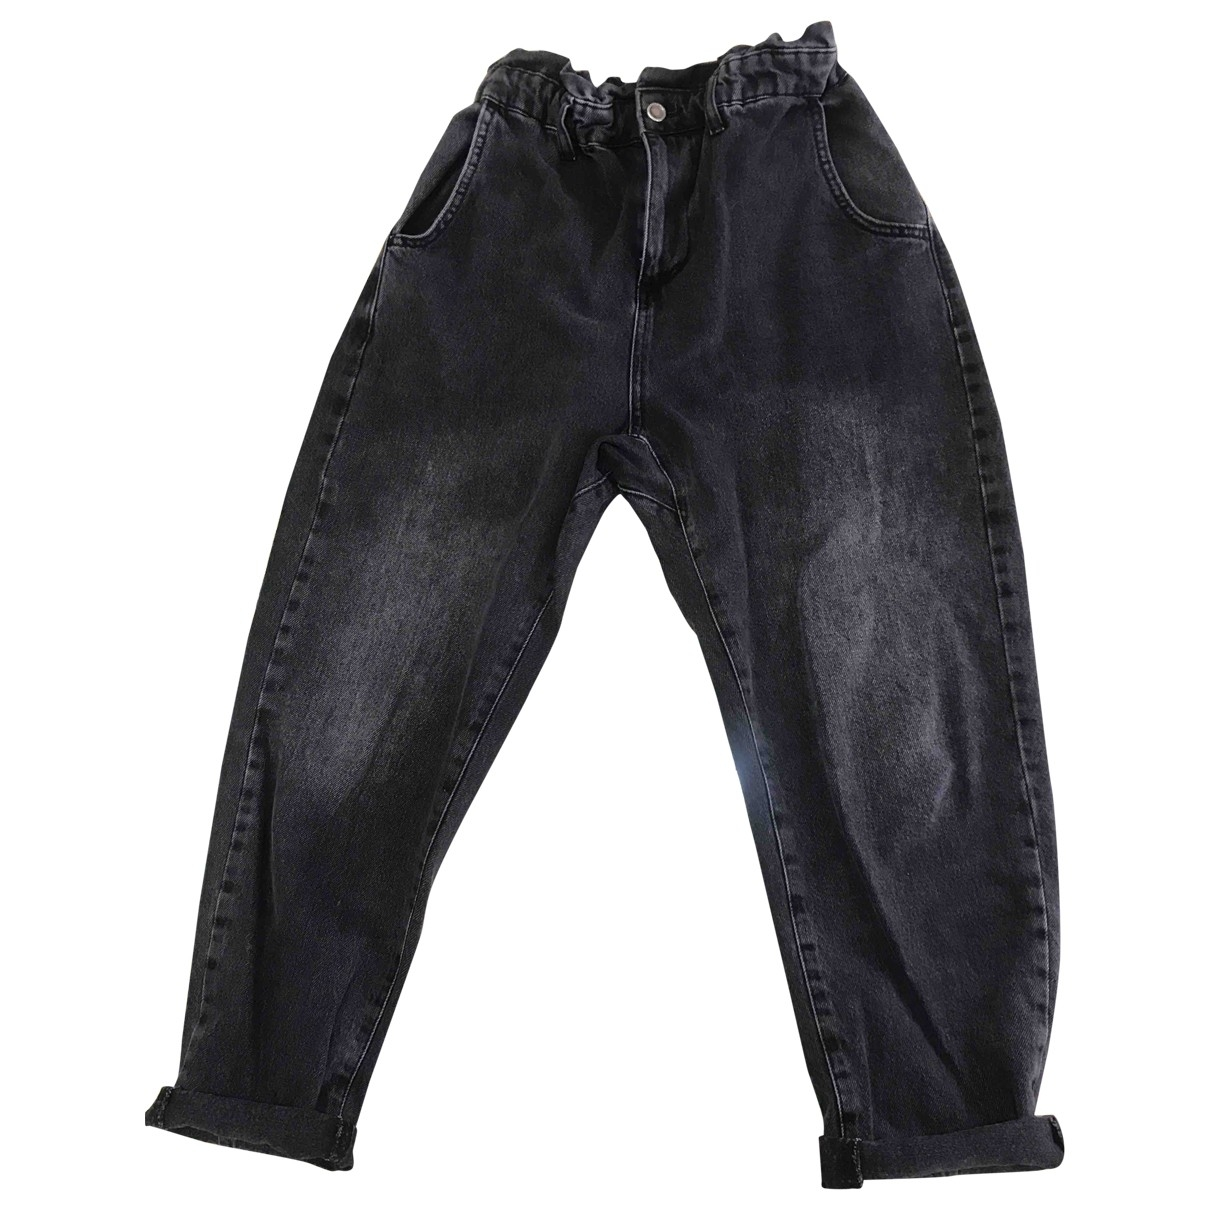 Zara \N Black Denim - Jeans Jeans for Women 26 US